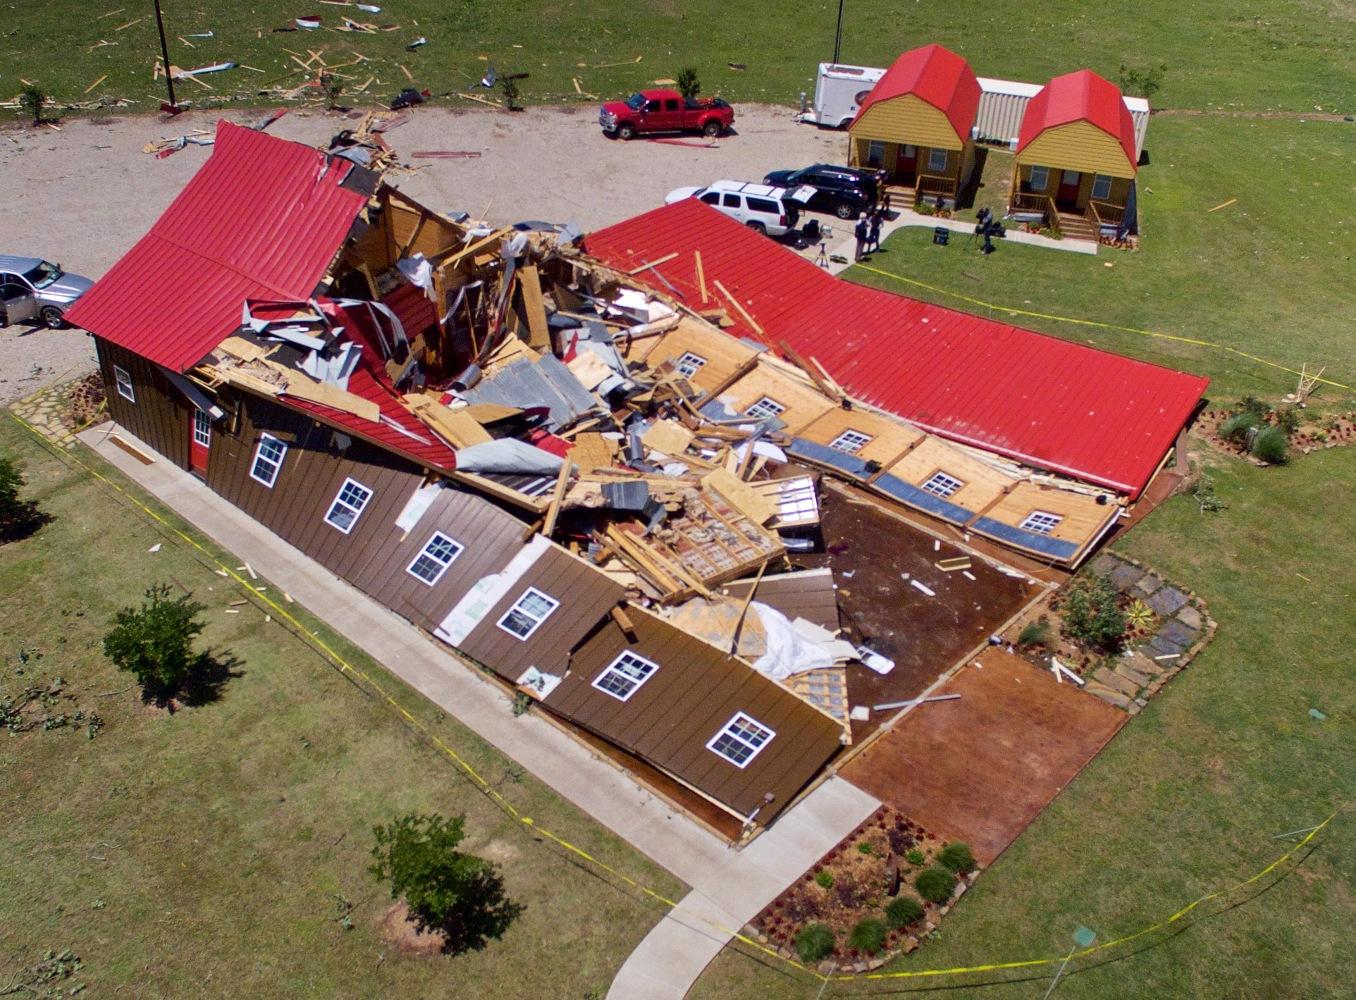 13 Dead Dozens Injured After Tornadoes Storms Batter